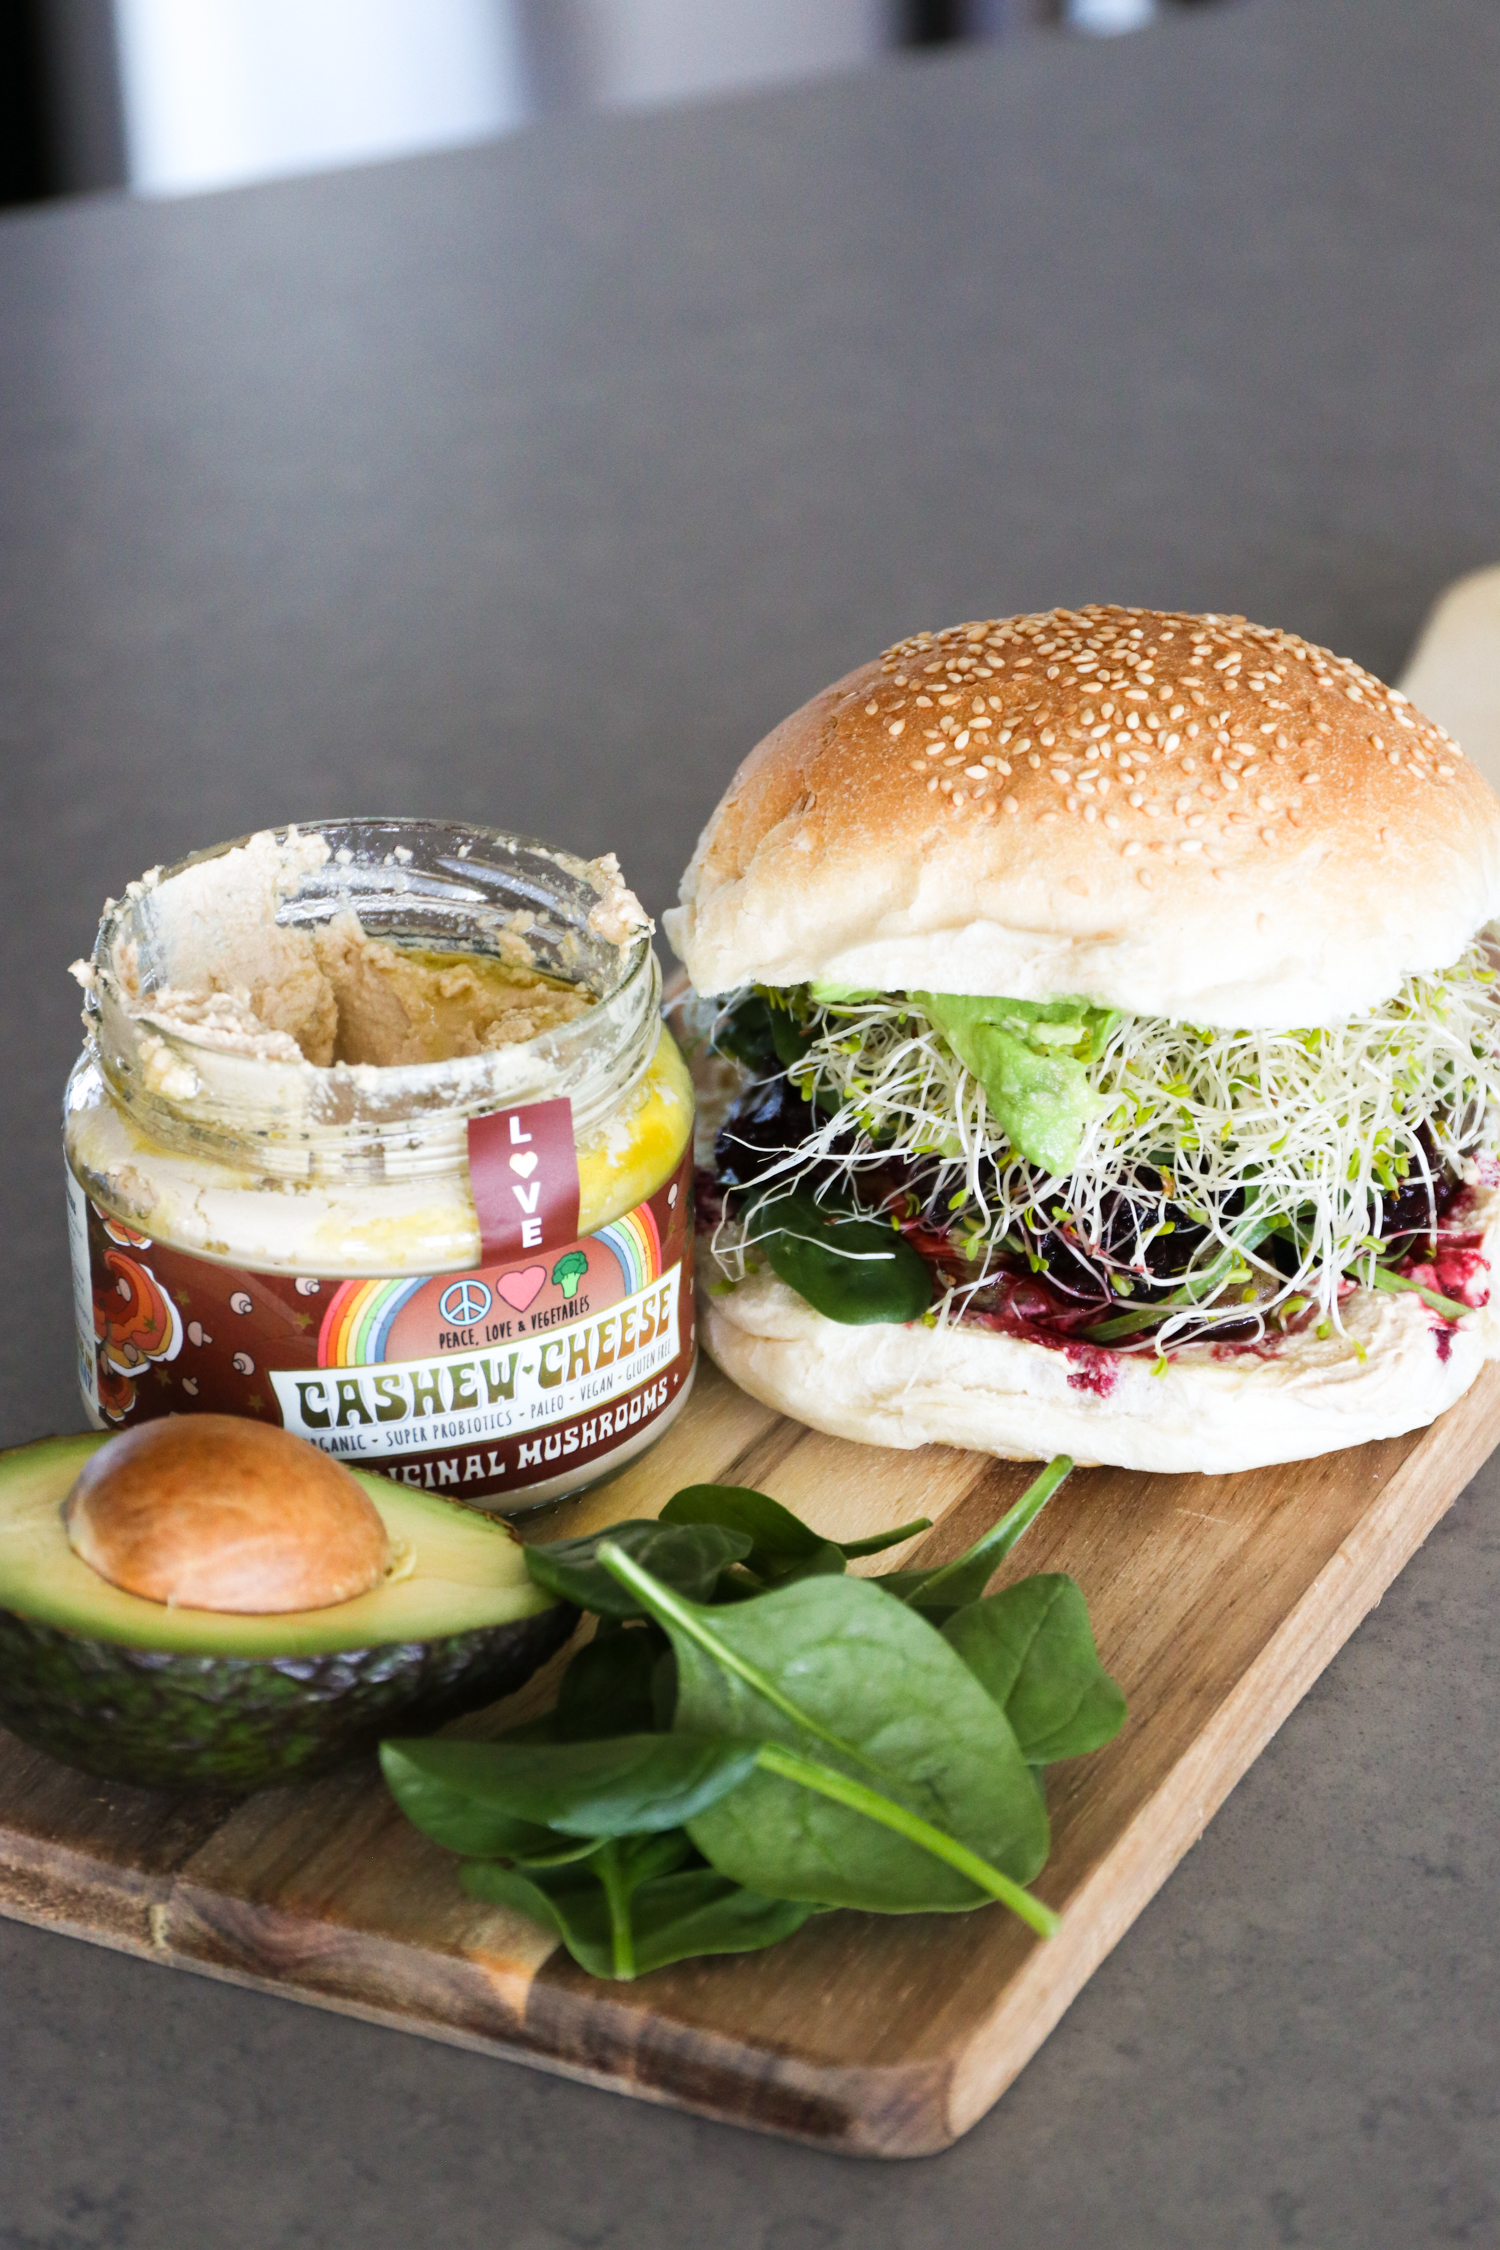 Portobello Mushroom Burger with PLV Cashew Cheese   WholeLife Pharmacy & Healthfoods